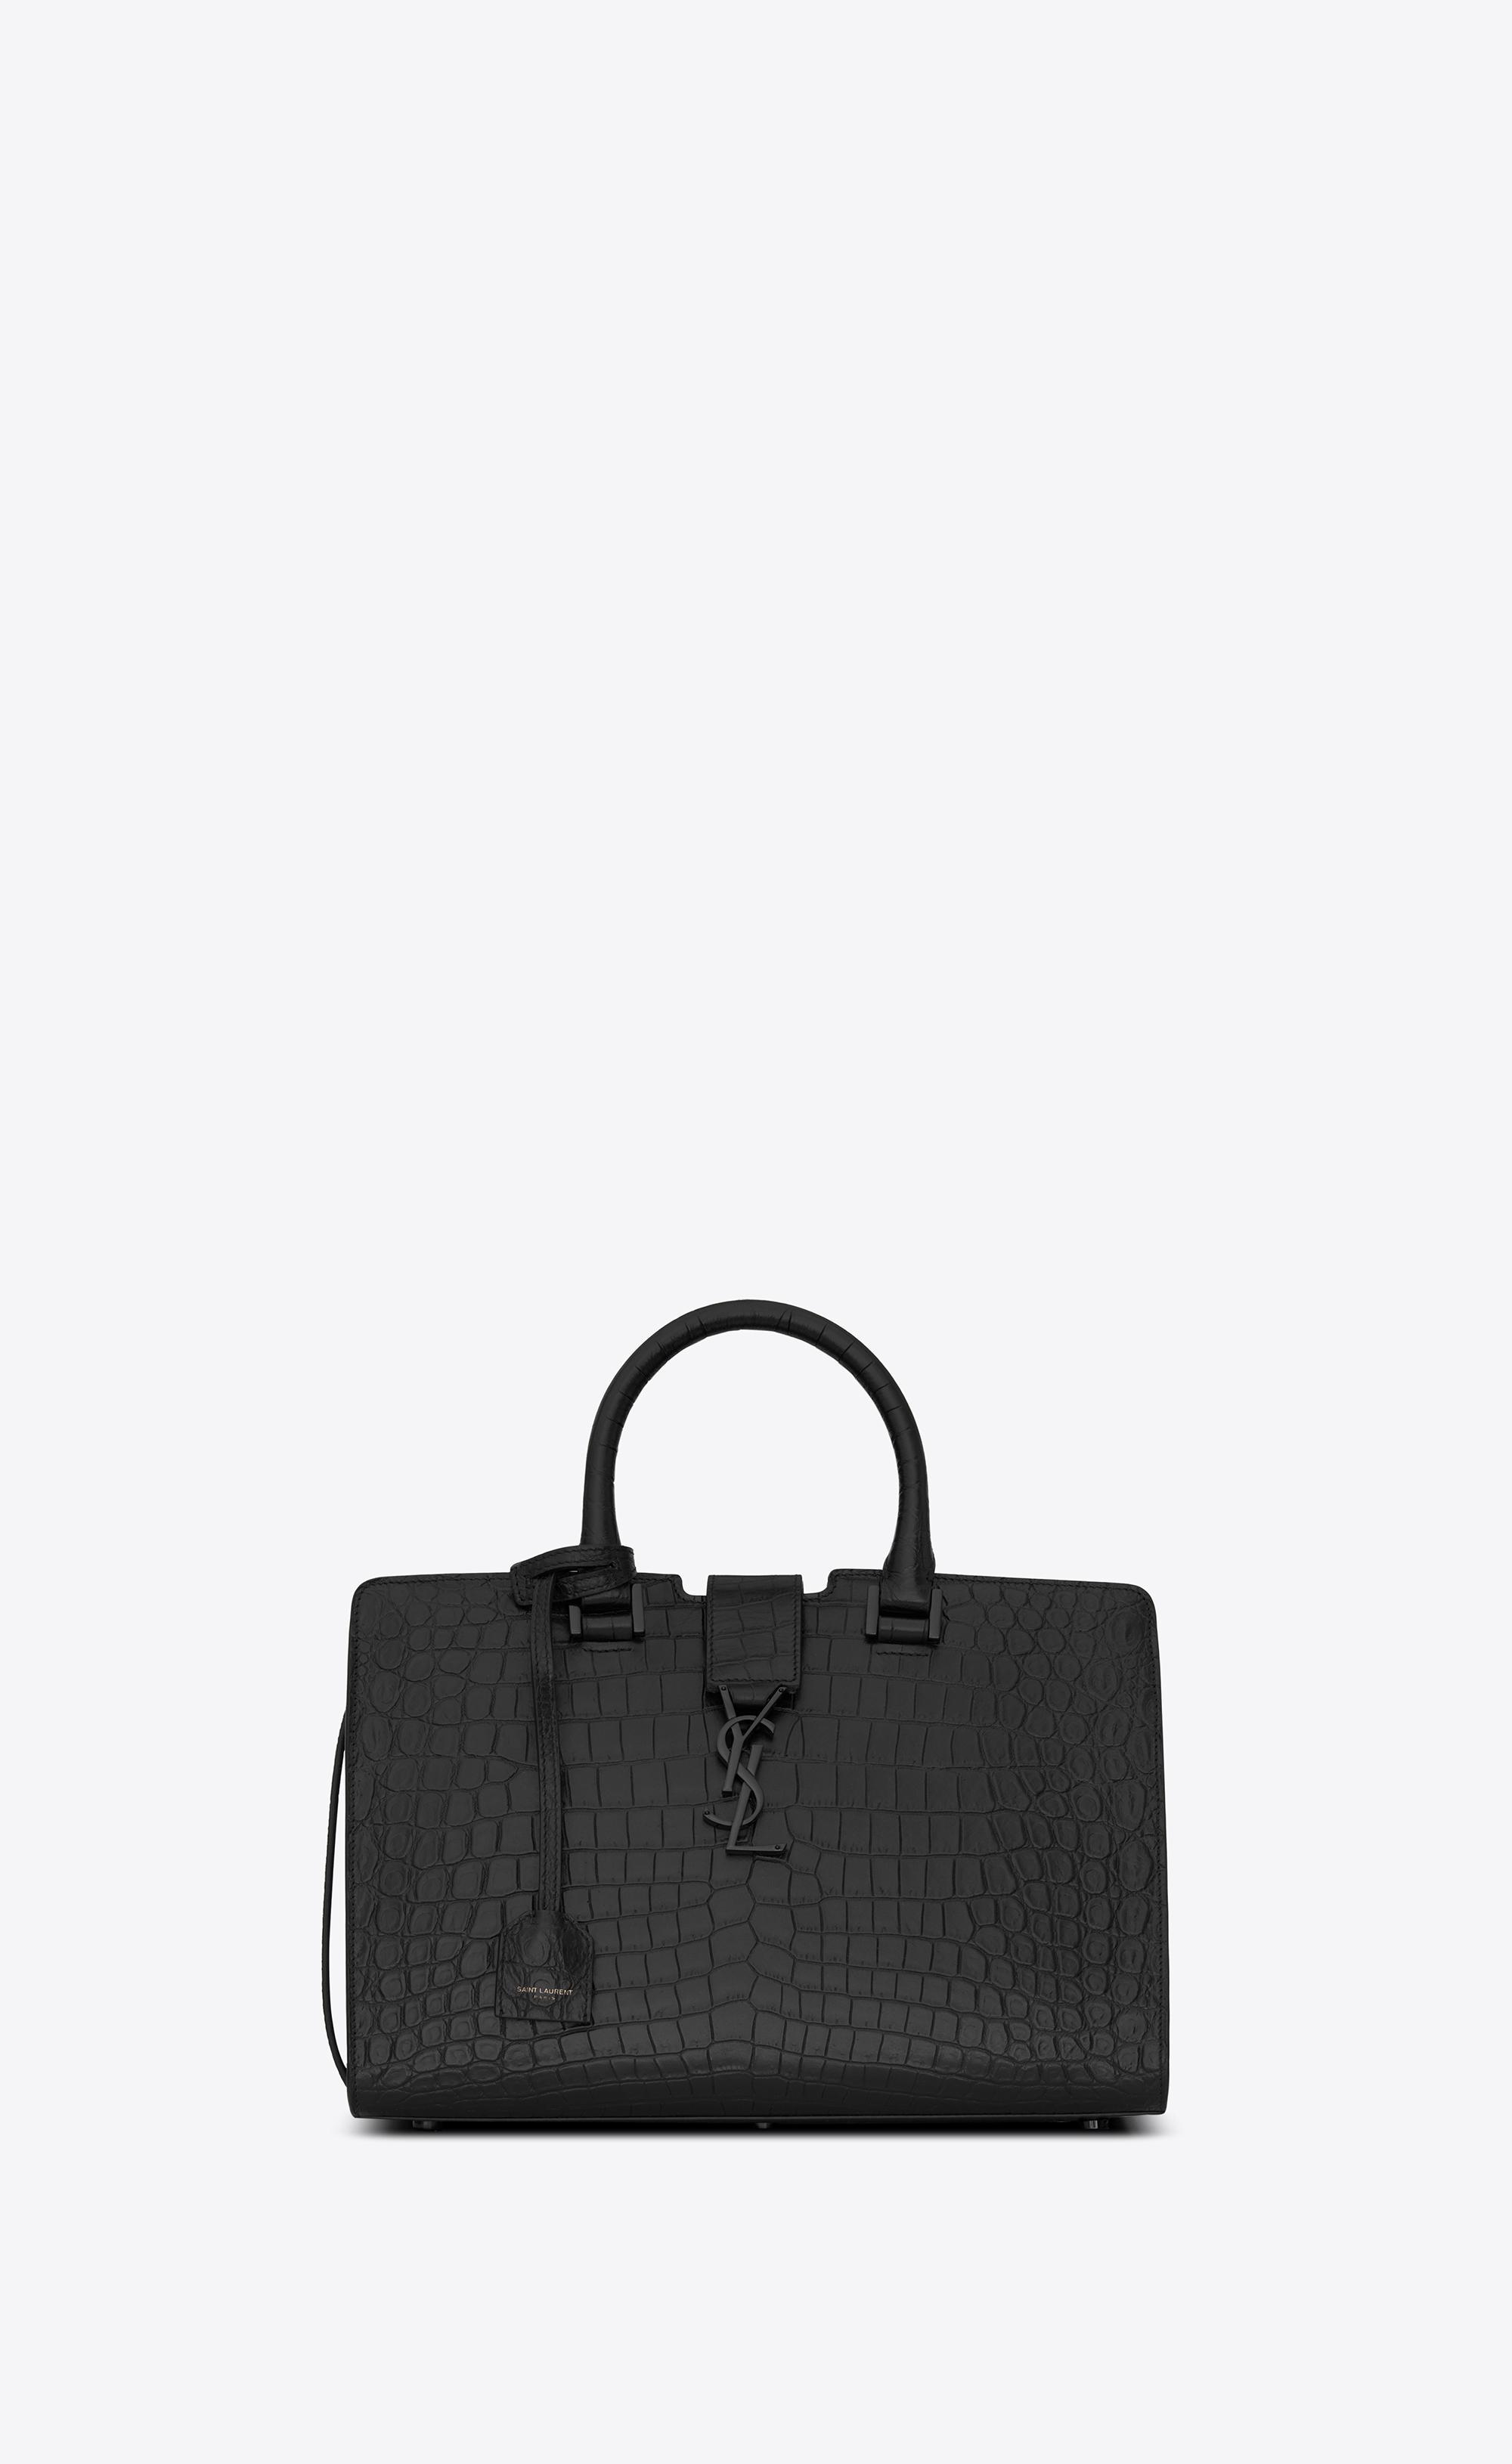 Saint Laurent - Small Cabas Ysl Bag In Black Crocodile Embossed Leather -  Lyst. View fullscreen f8ae91f247